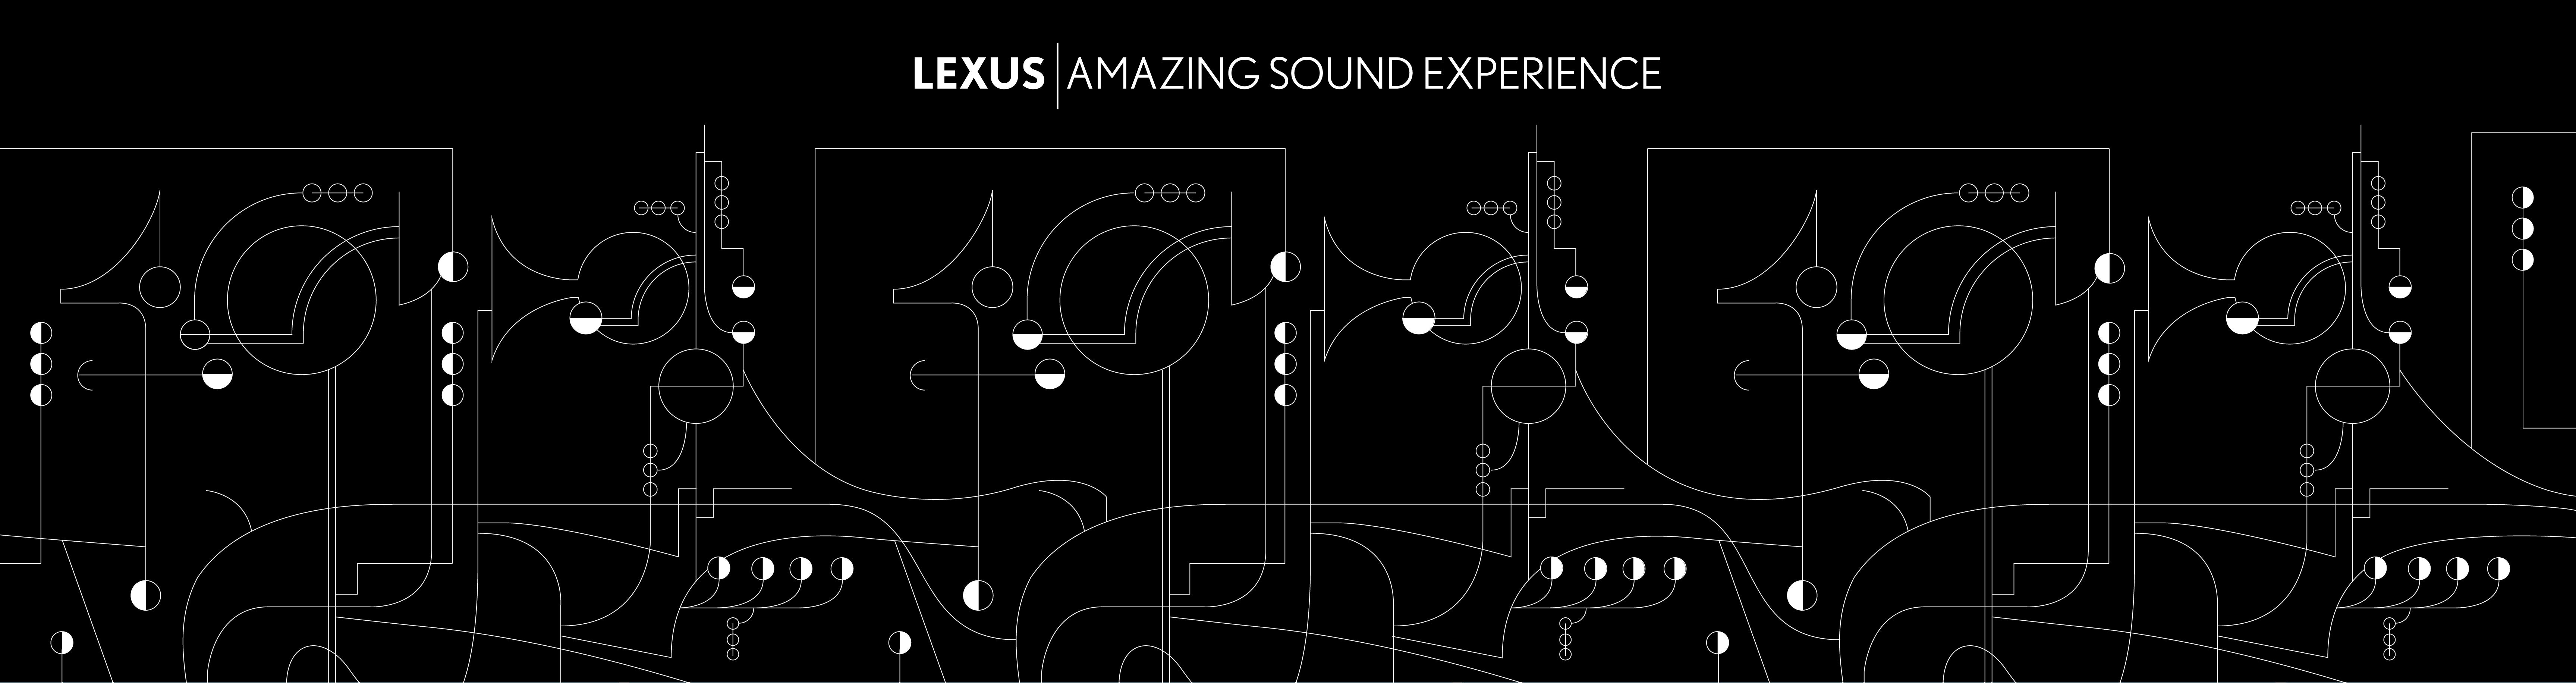 incontri-d-musica-lexus-amazing-sound-experience-brand-activation-grafica-muro